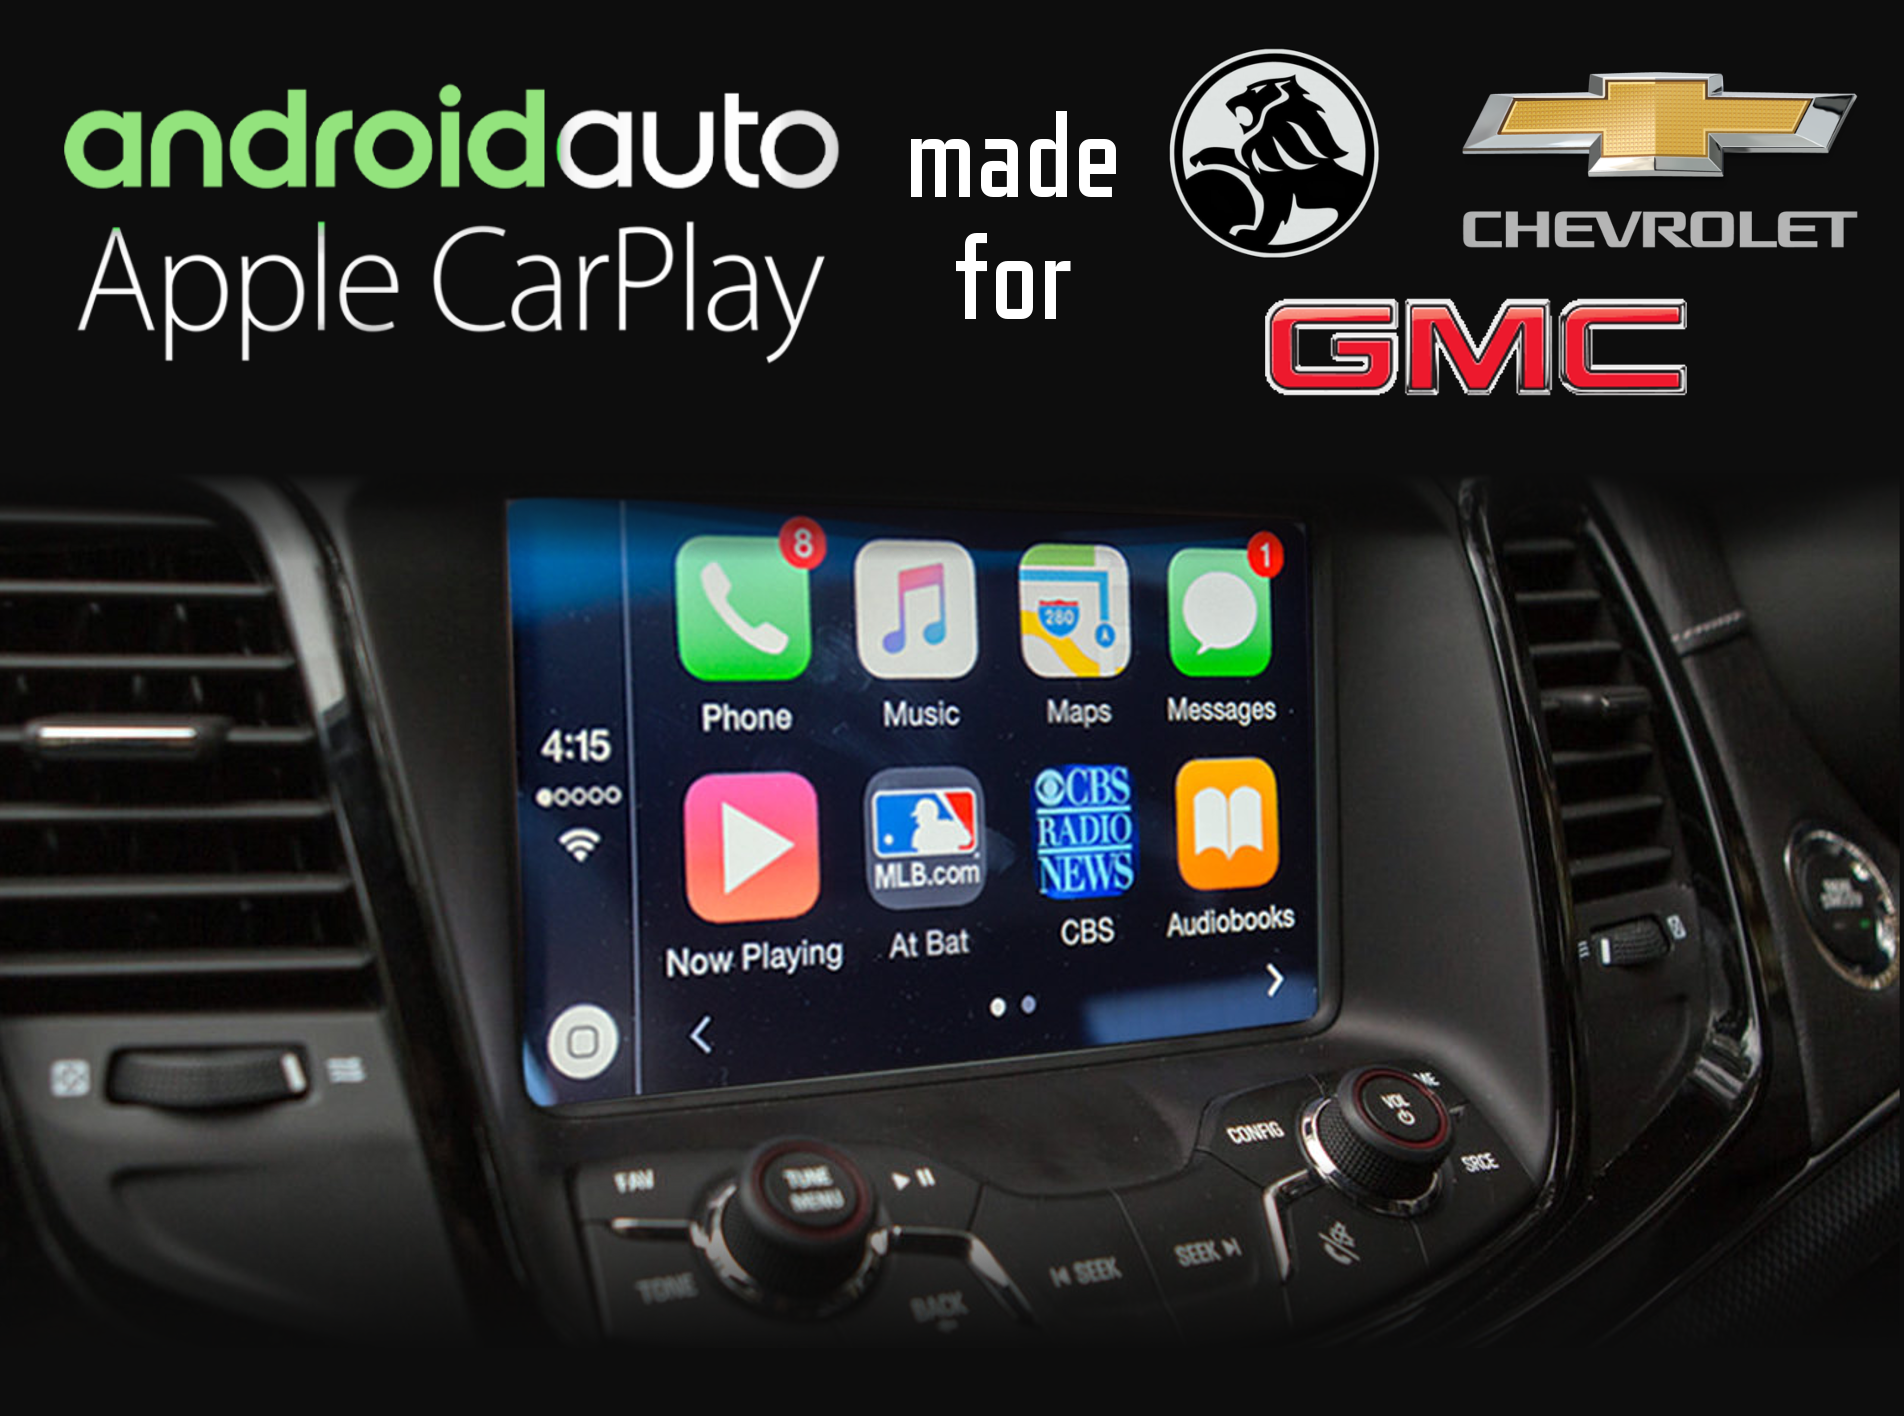 Aftermarket Apple Carplay, Android Auto integration for Holen, Chevrolet, GMC radio screens for Acadia, Camaro, Canyon, Caprice-V, Cruze, Colorado, Corvette, Impala, Malibu, Sierra, Silverado, Suburban, Tahoe, Terrain, Trax, VF, Volt, Yukon